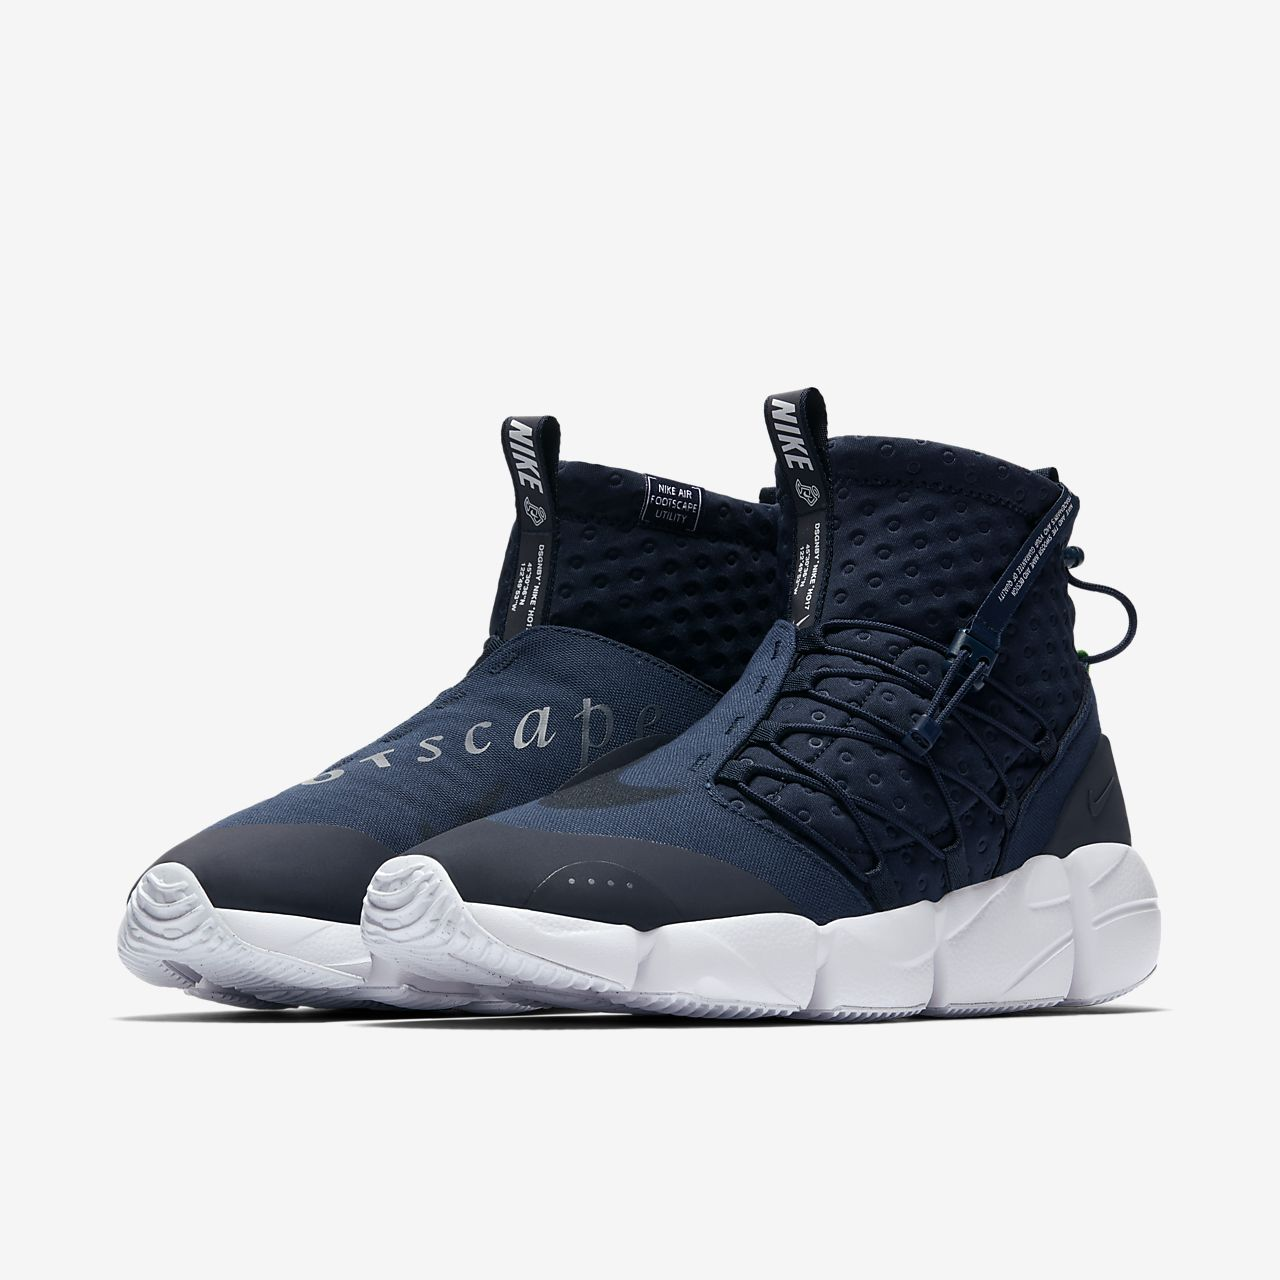 Nike Air Footscape Mid Utility 'Obsidian & White